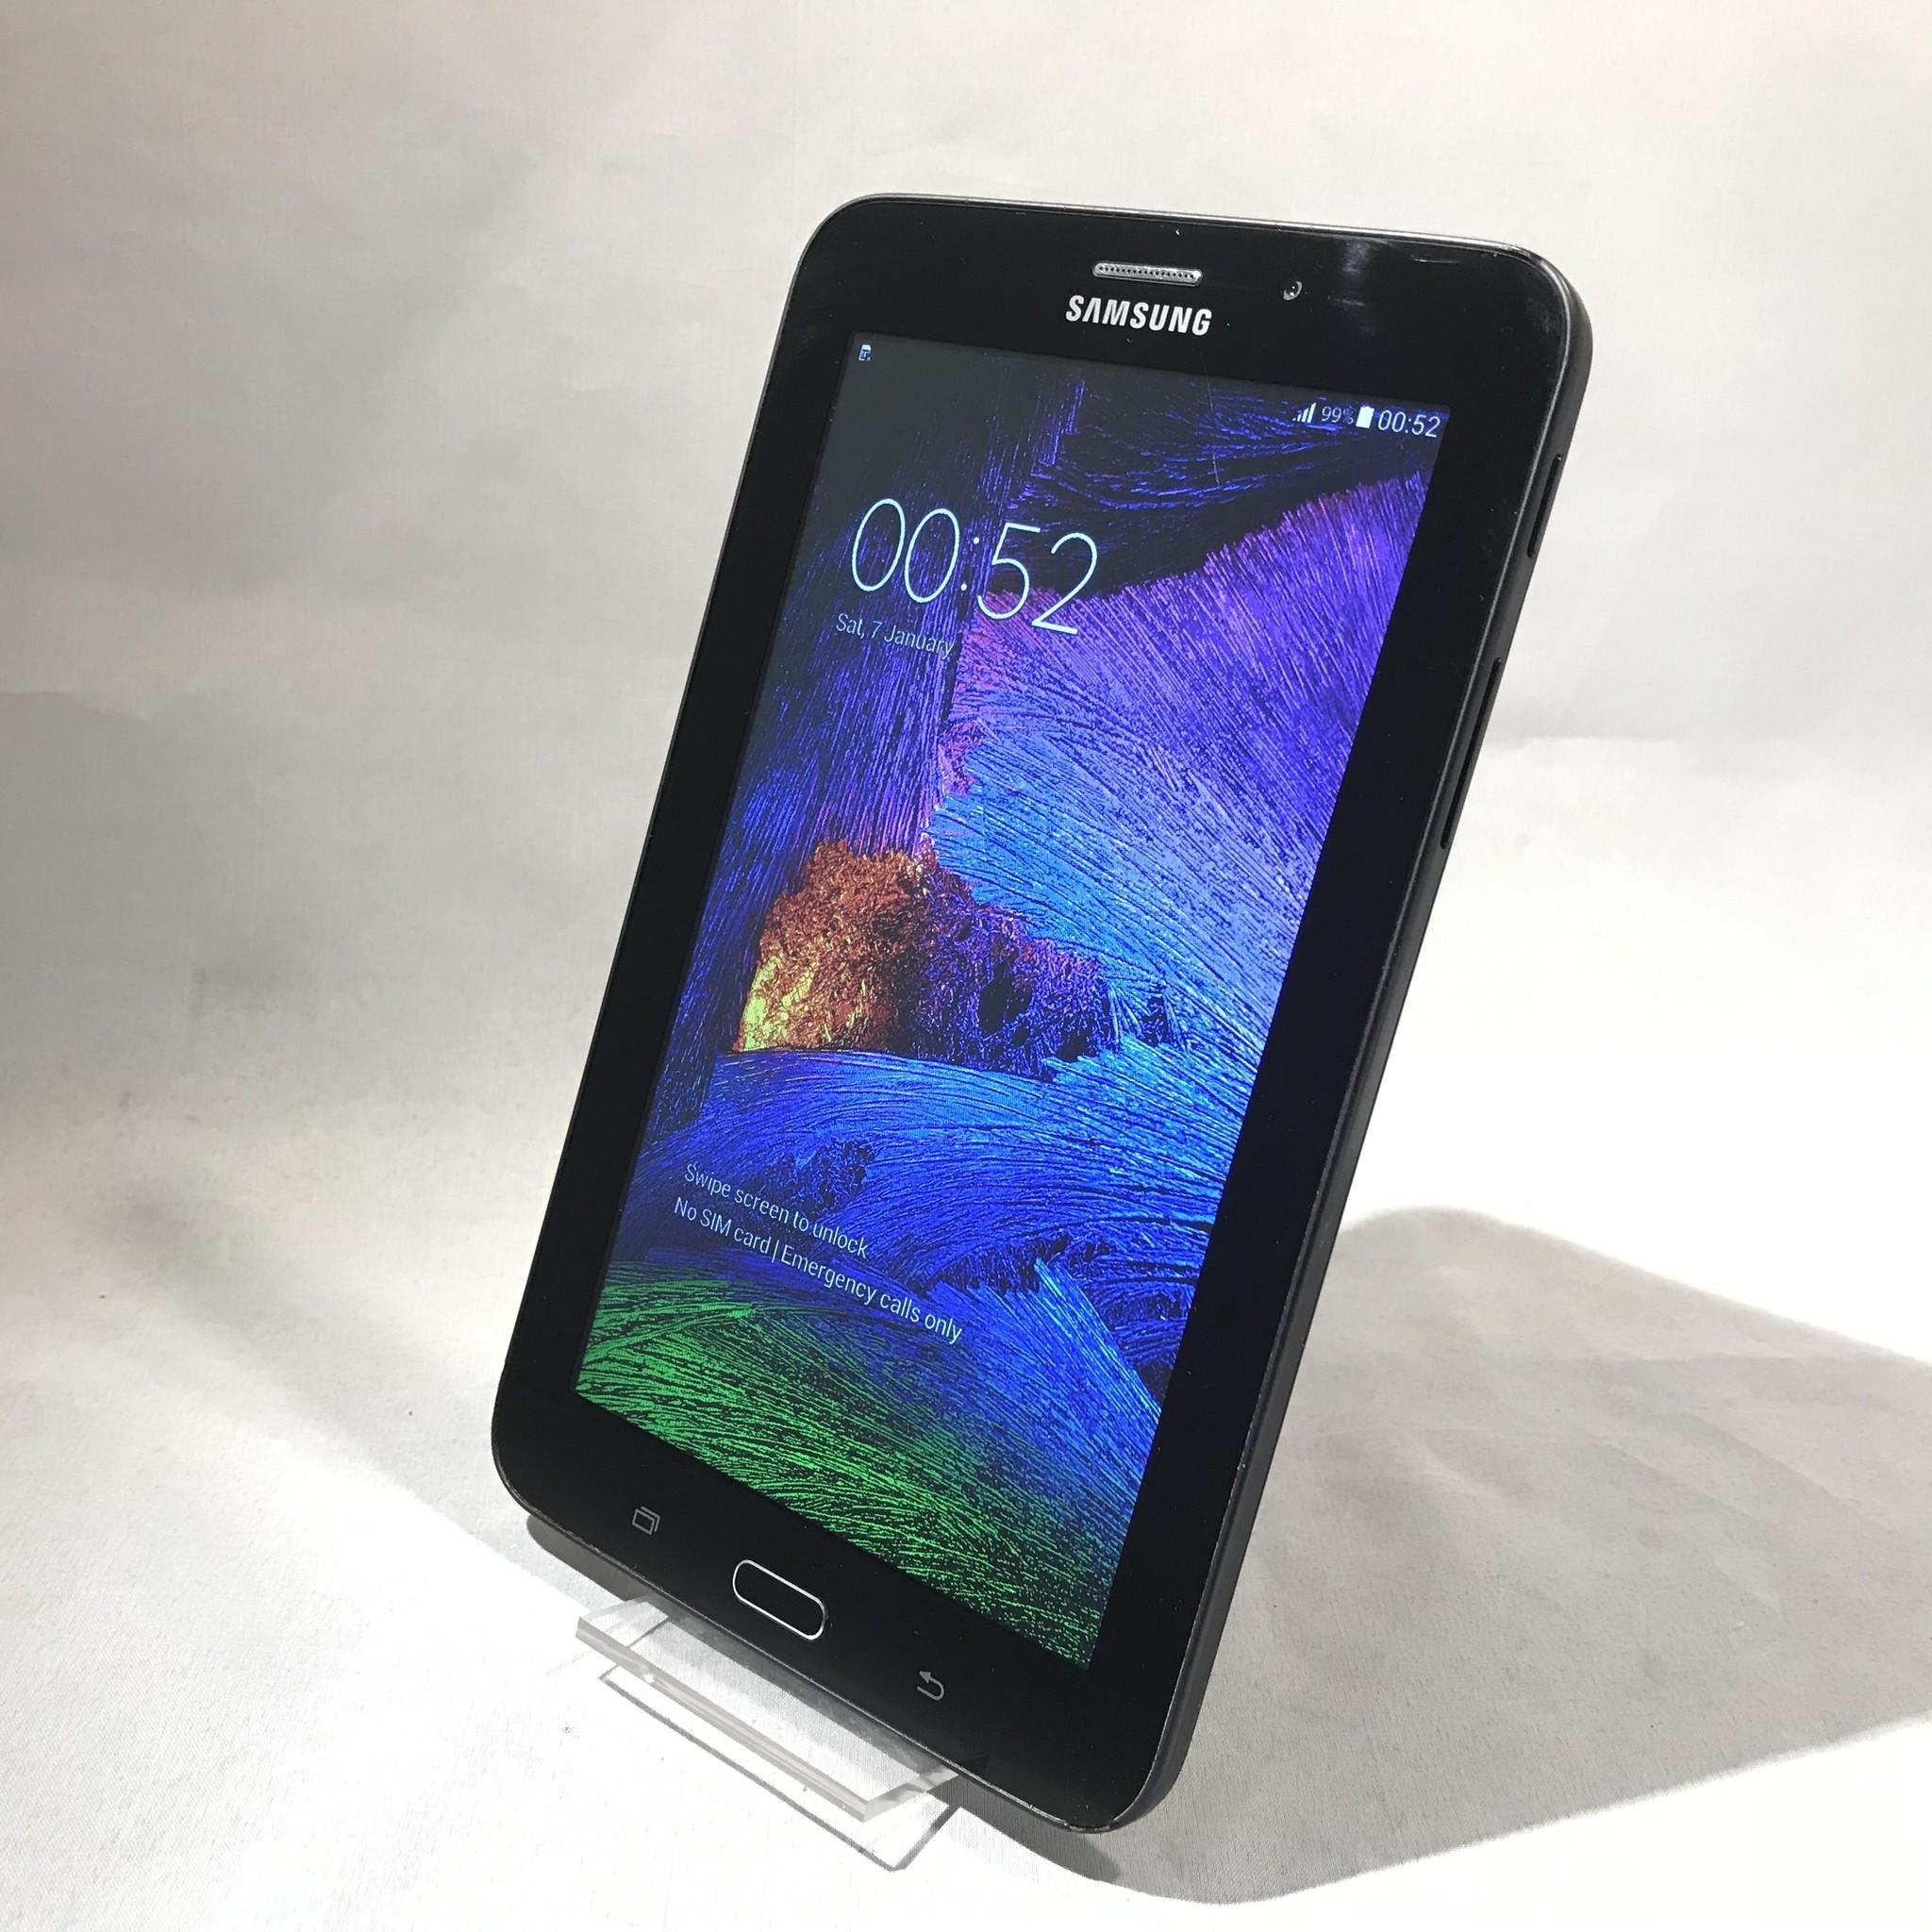 samsung Samsung Galaxy Tab 3 V simkaart